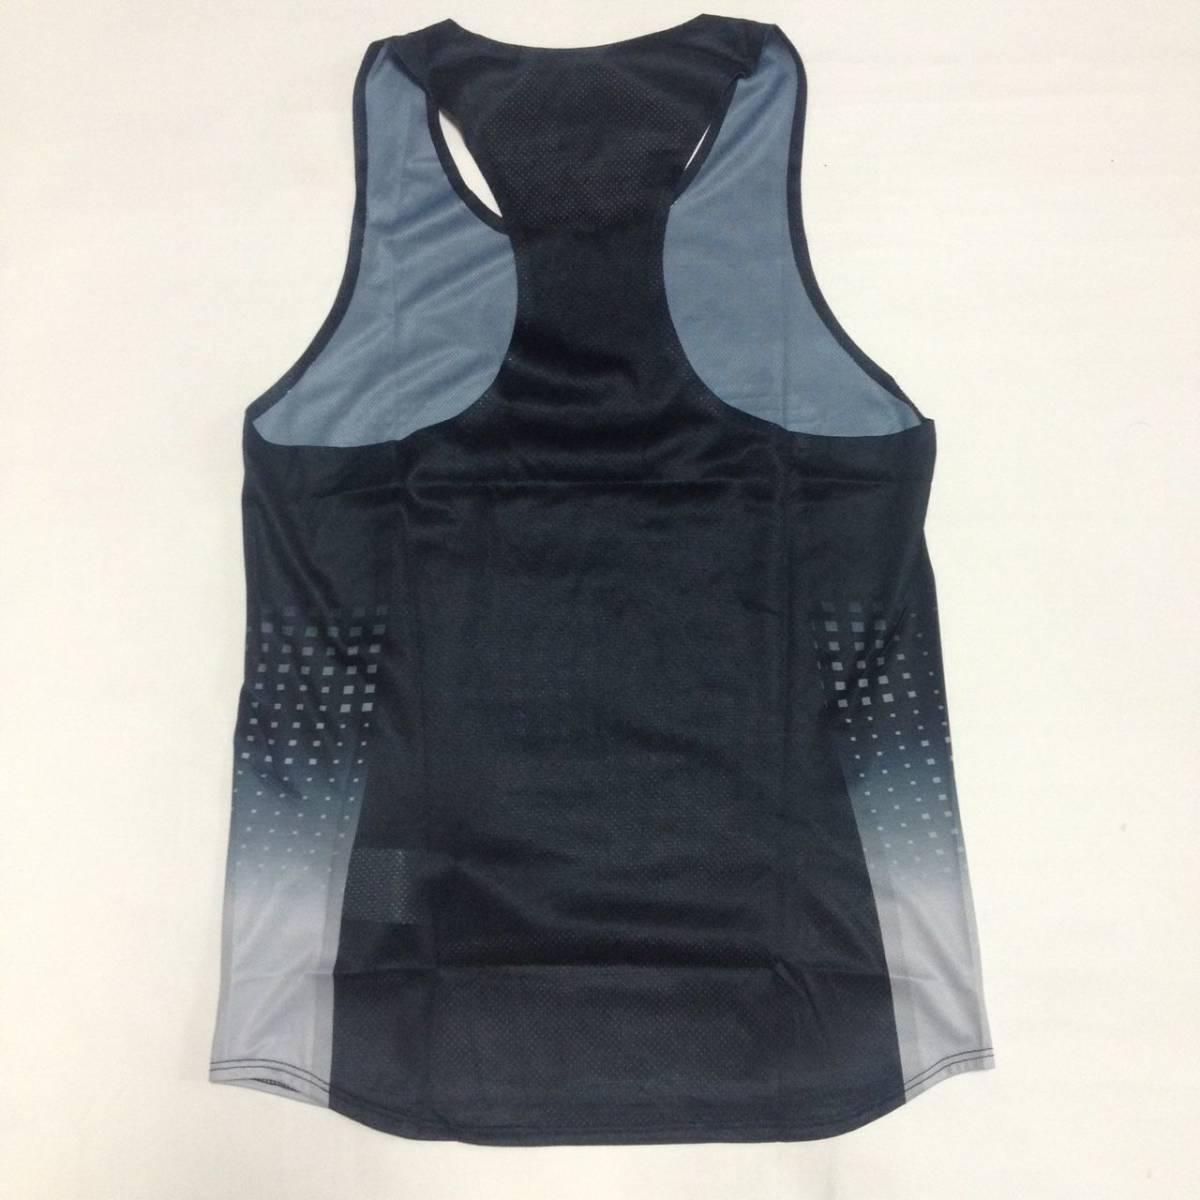 【Mサイズ】Nike Pro Elite オレゴンプロジェクト Raceday Uniform【Oregon Project】